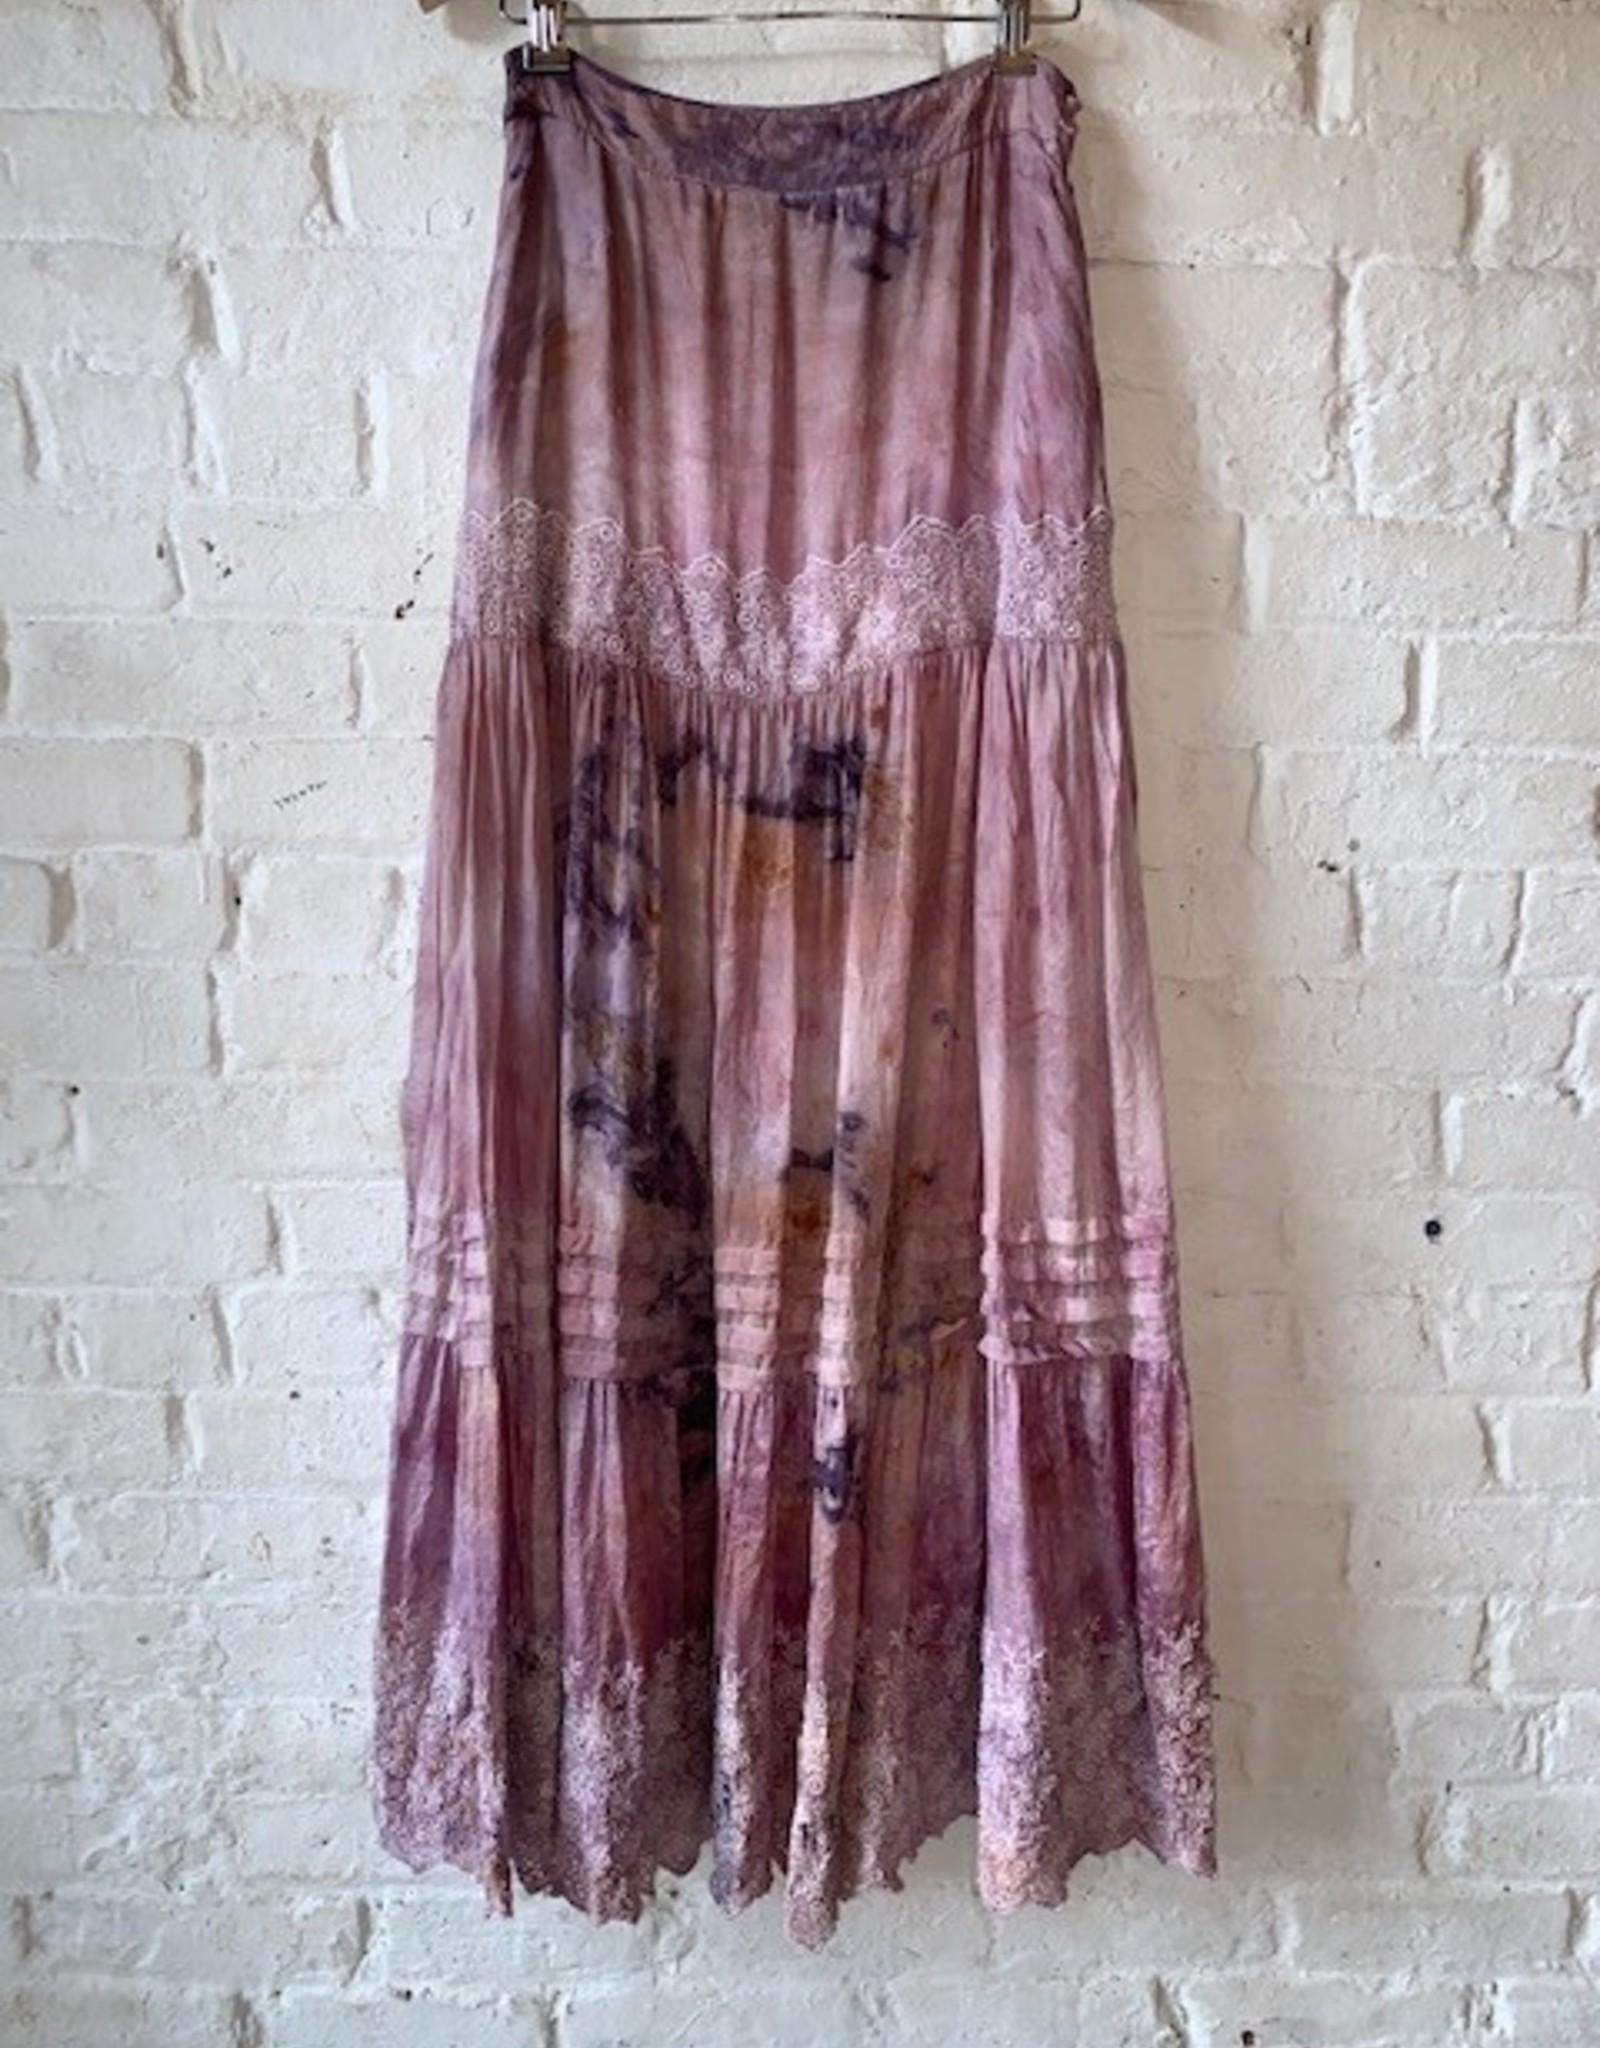 MIMI PROBER - Tie Dye Skirt